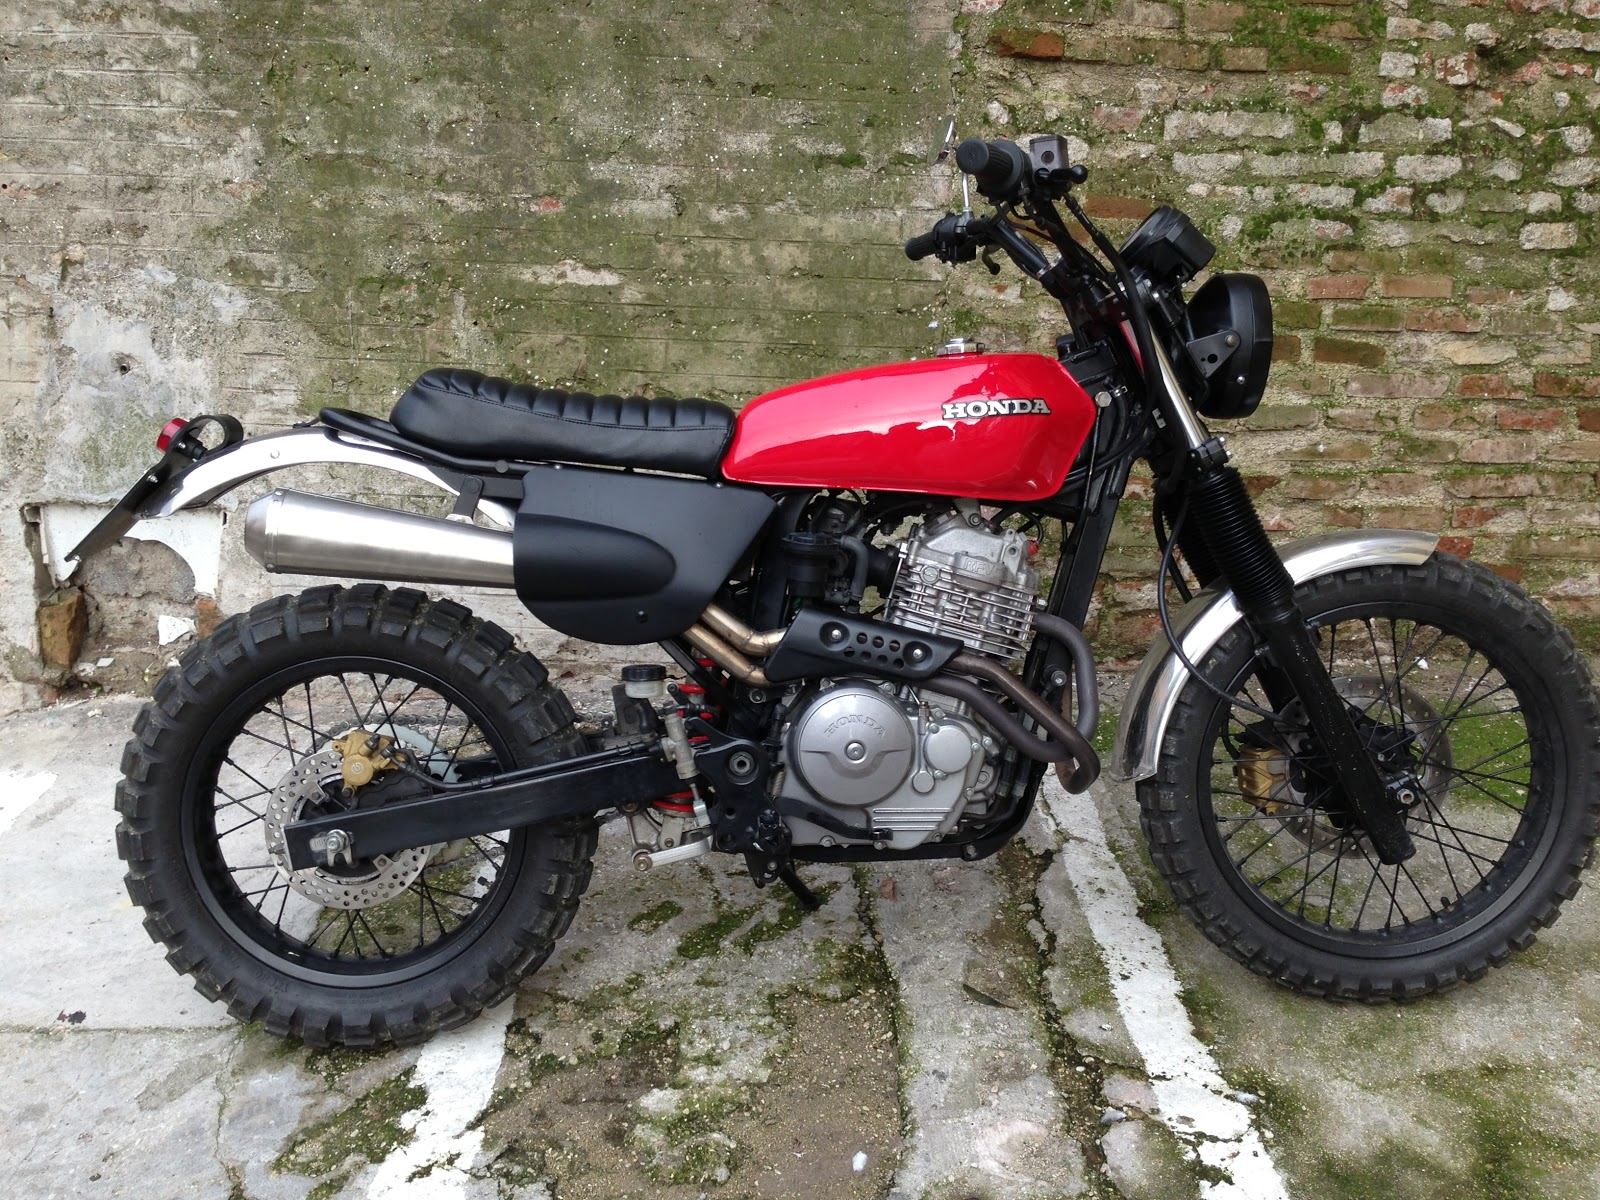 Honda Slr 650 Scrambler Modification Motorcycle Style